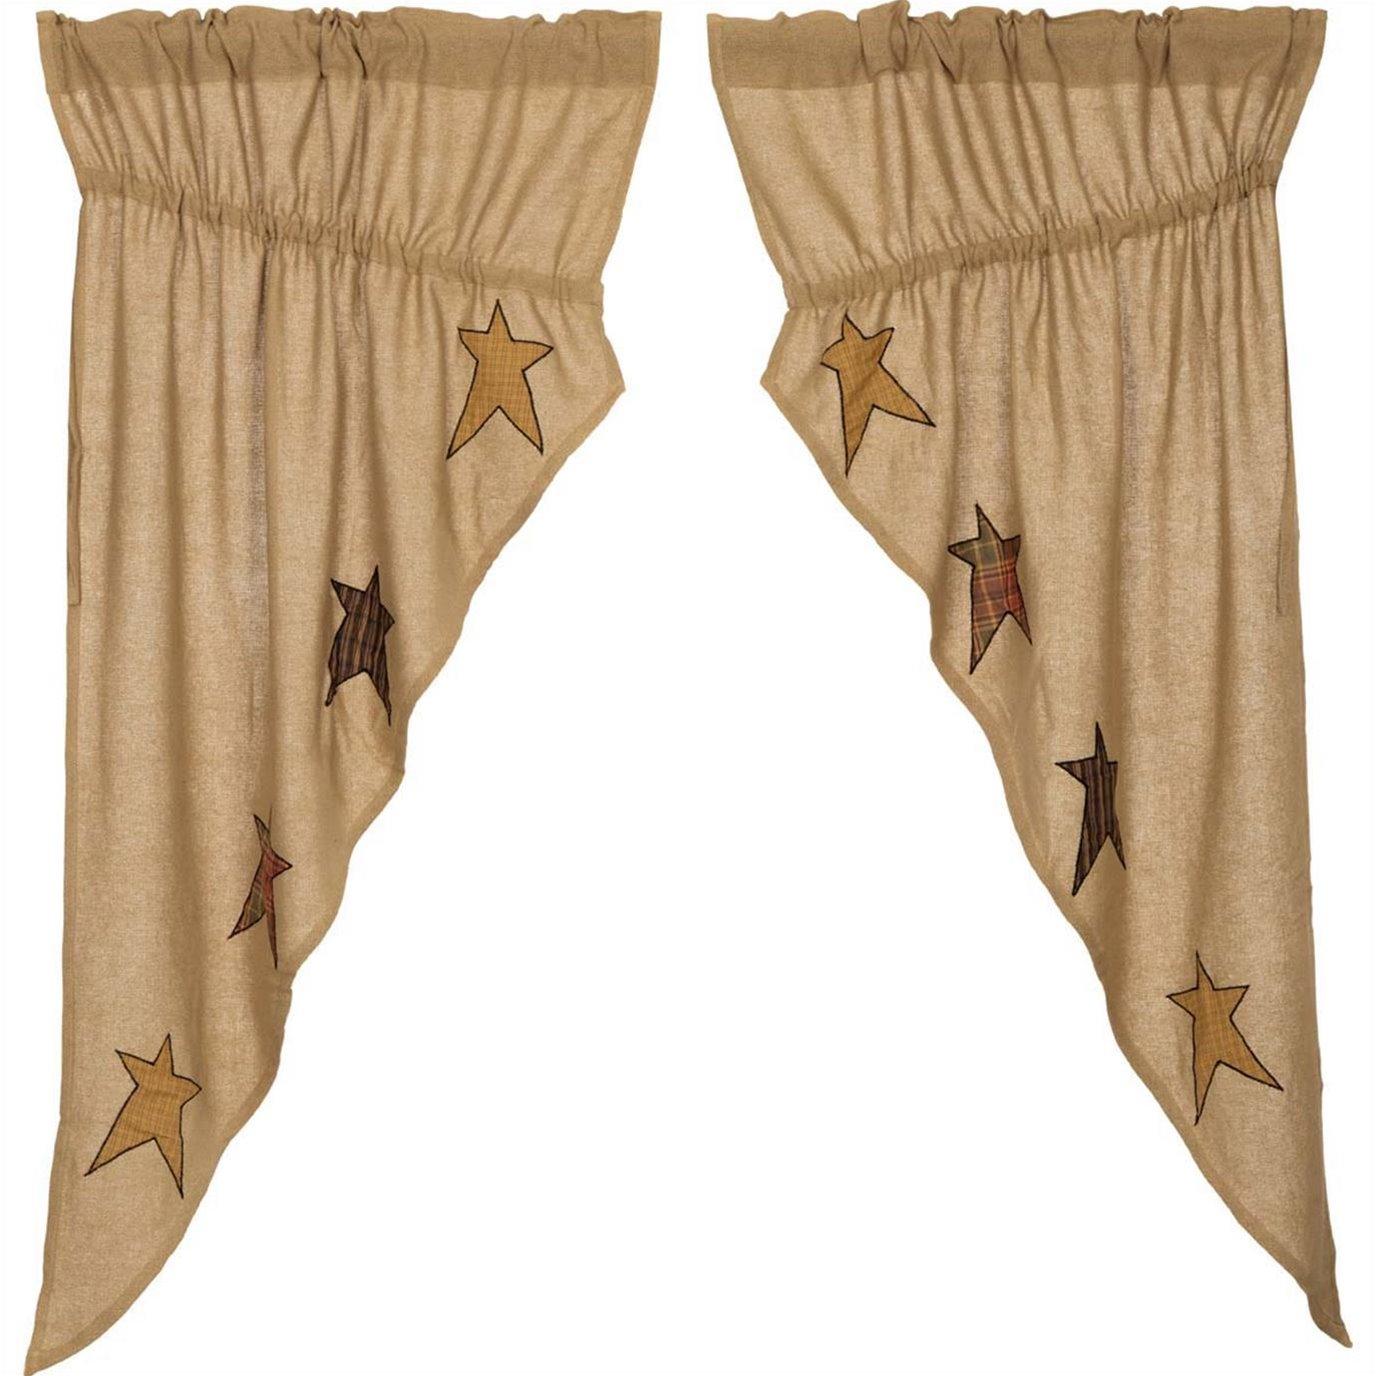 Stratton Burlap Applique Star Prairie Curtain set of 2 panels 63x36x18